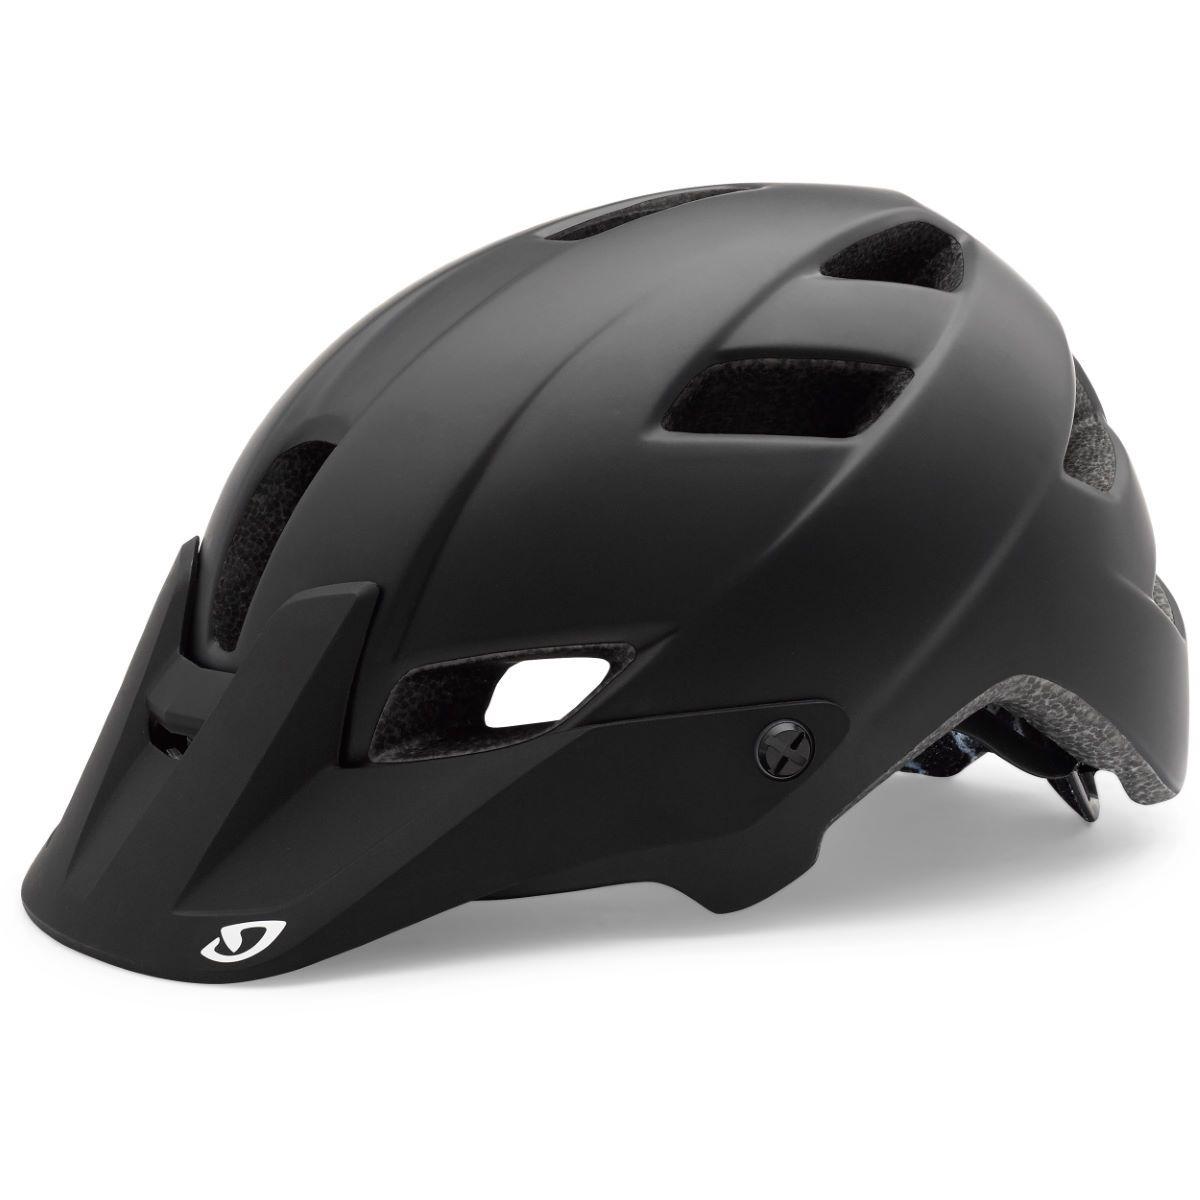 Giro Women S Feather Helmet Mtb Helmets Mountain Bike Helmets Cycling Helmet Bicycle Helmet